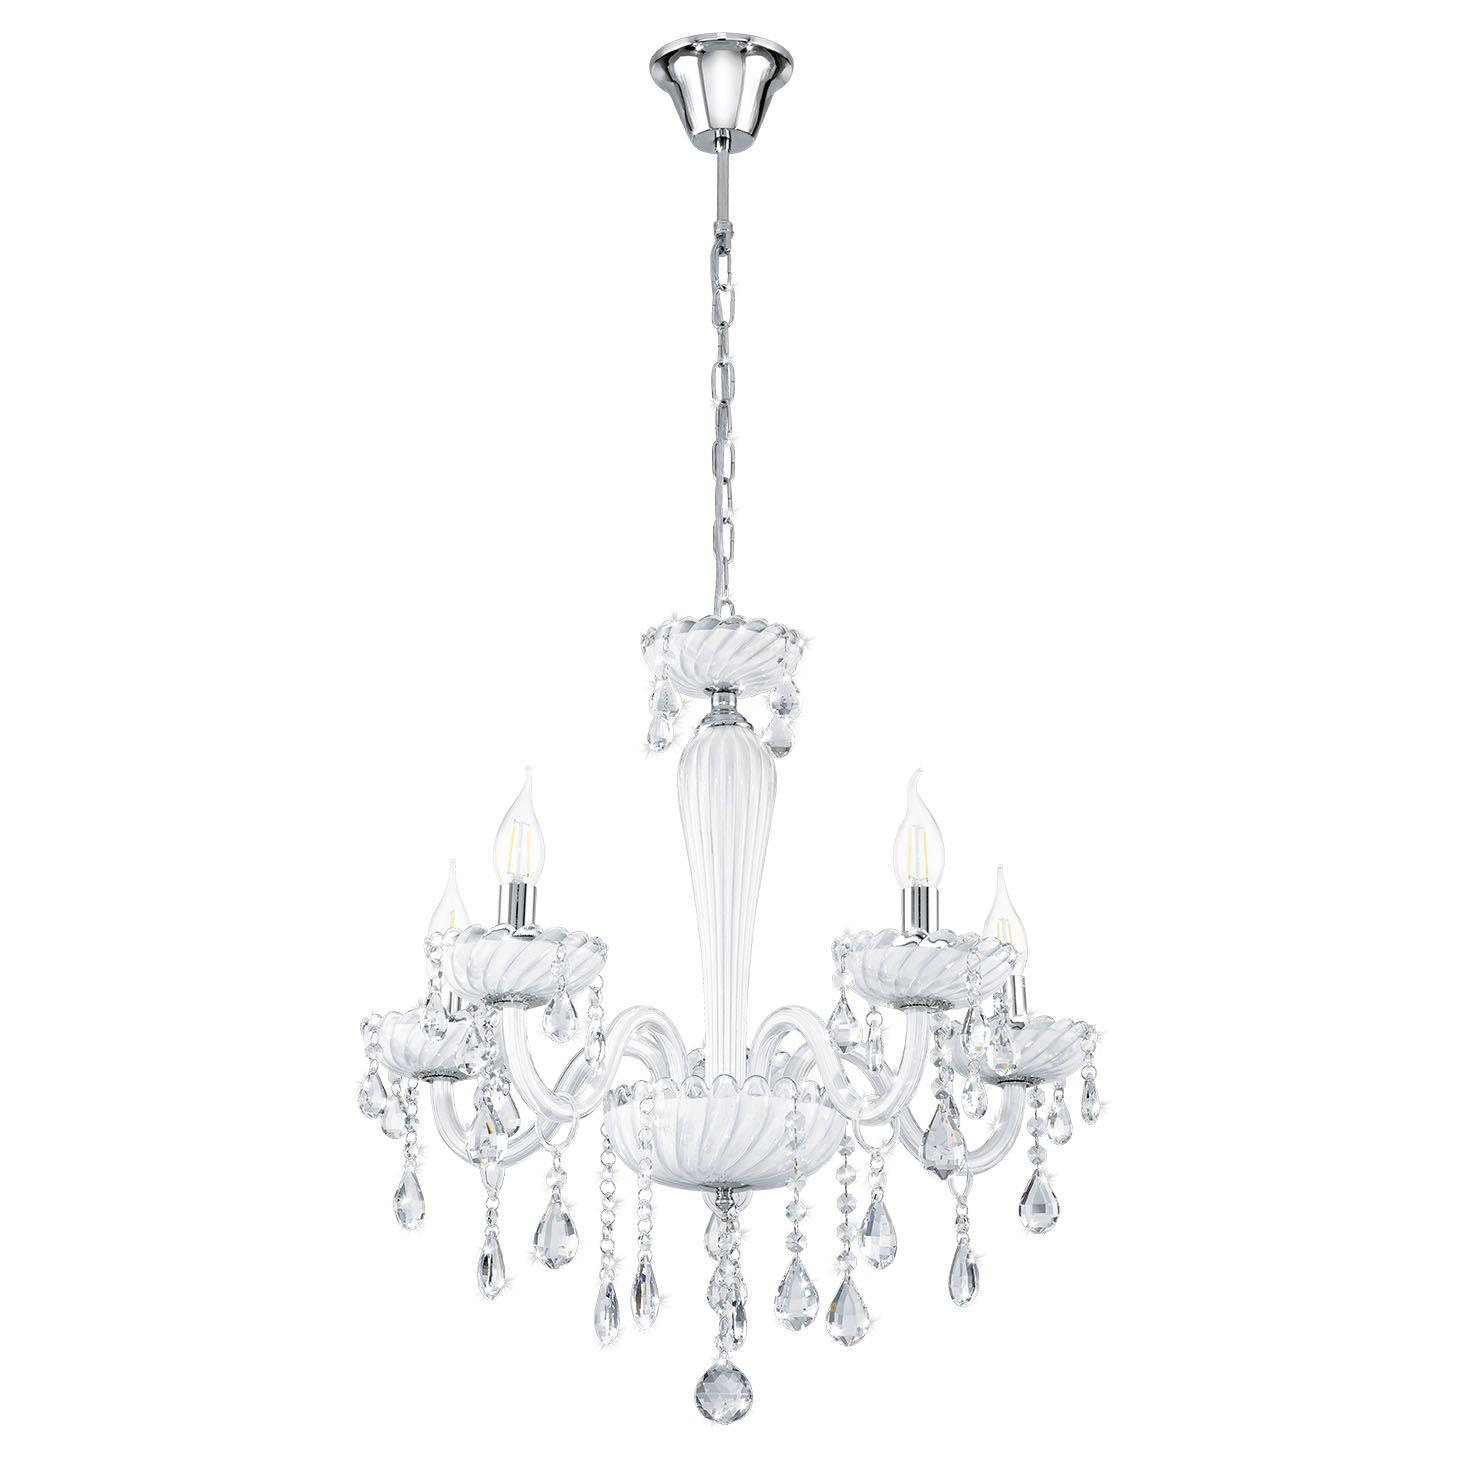 Lusteri Visece Lampe Eglo Ceiling Lights Chandelier